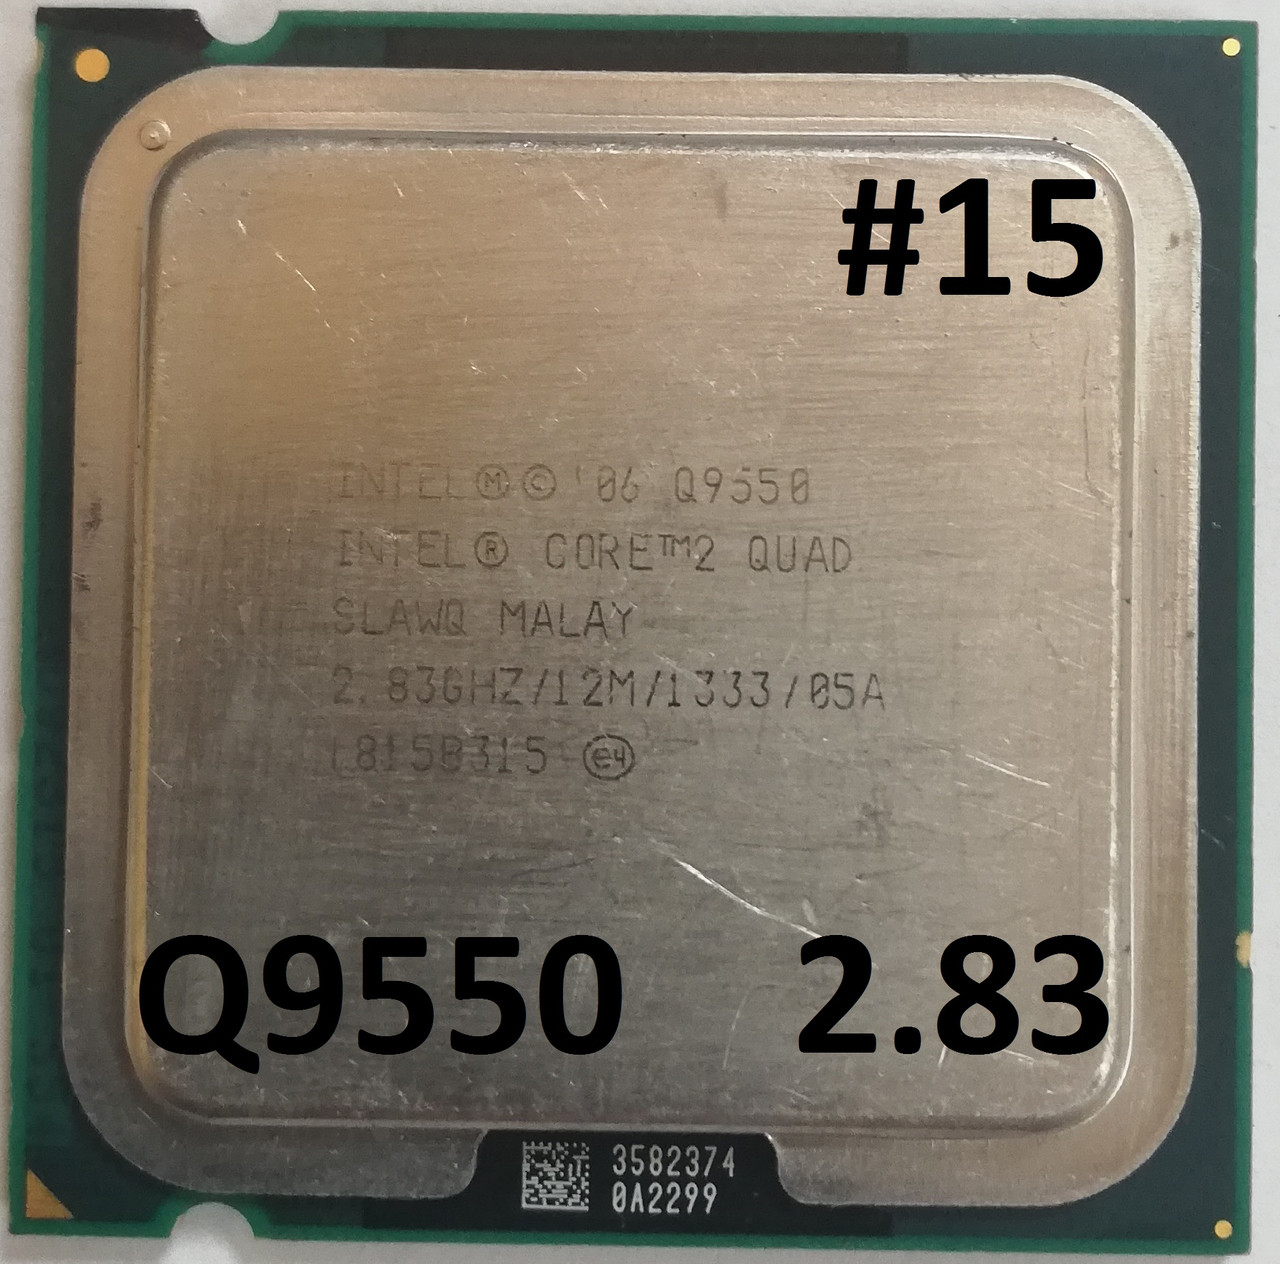 Процессор ЛОТ#15 Intel® Core™2 Quad Q9550 SLAWQ 2.83GHz 12M Cache 1333 MHz FSB Soket 775 Б/У